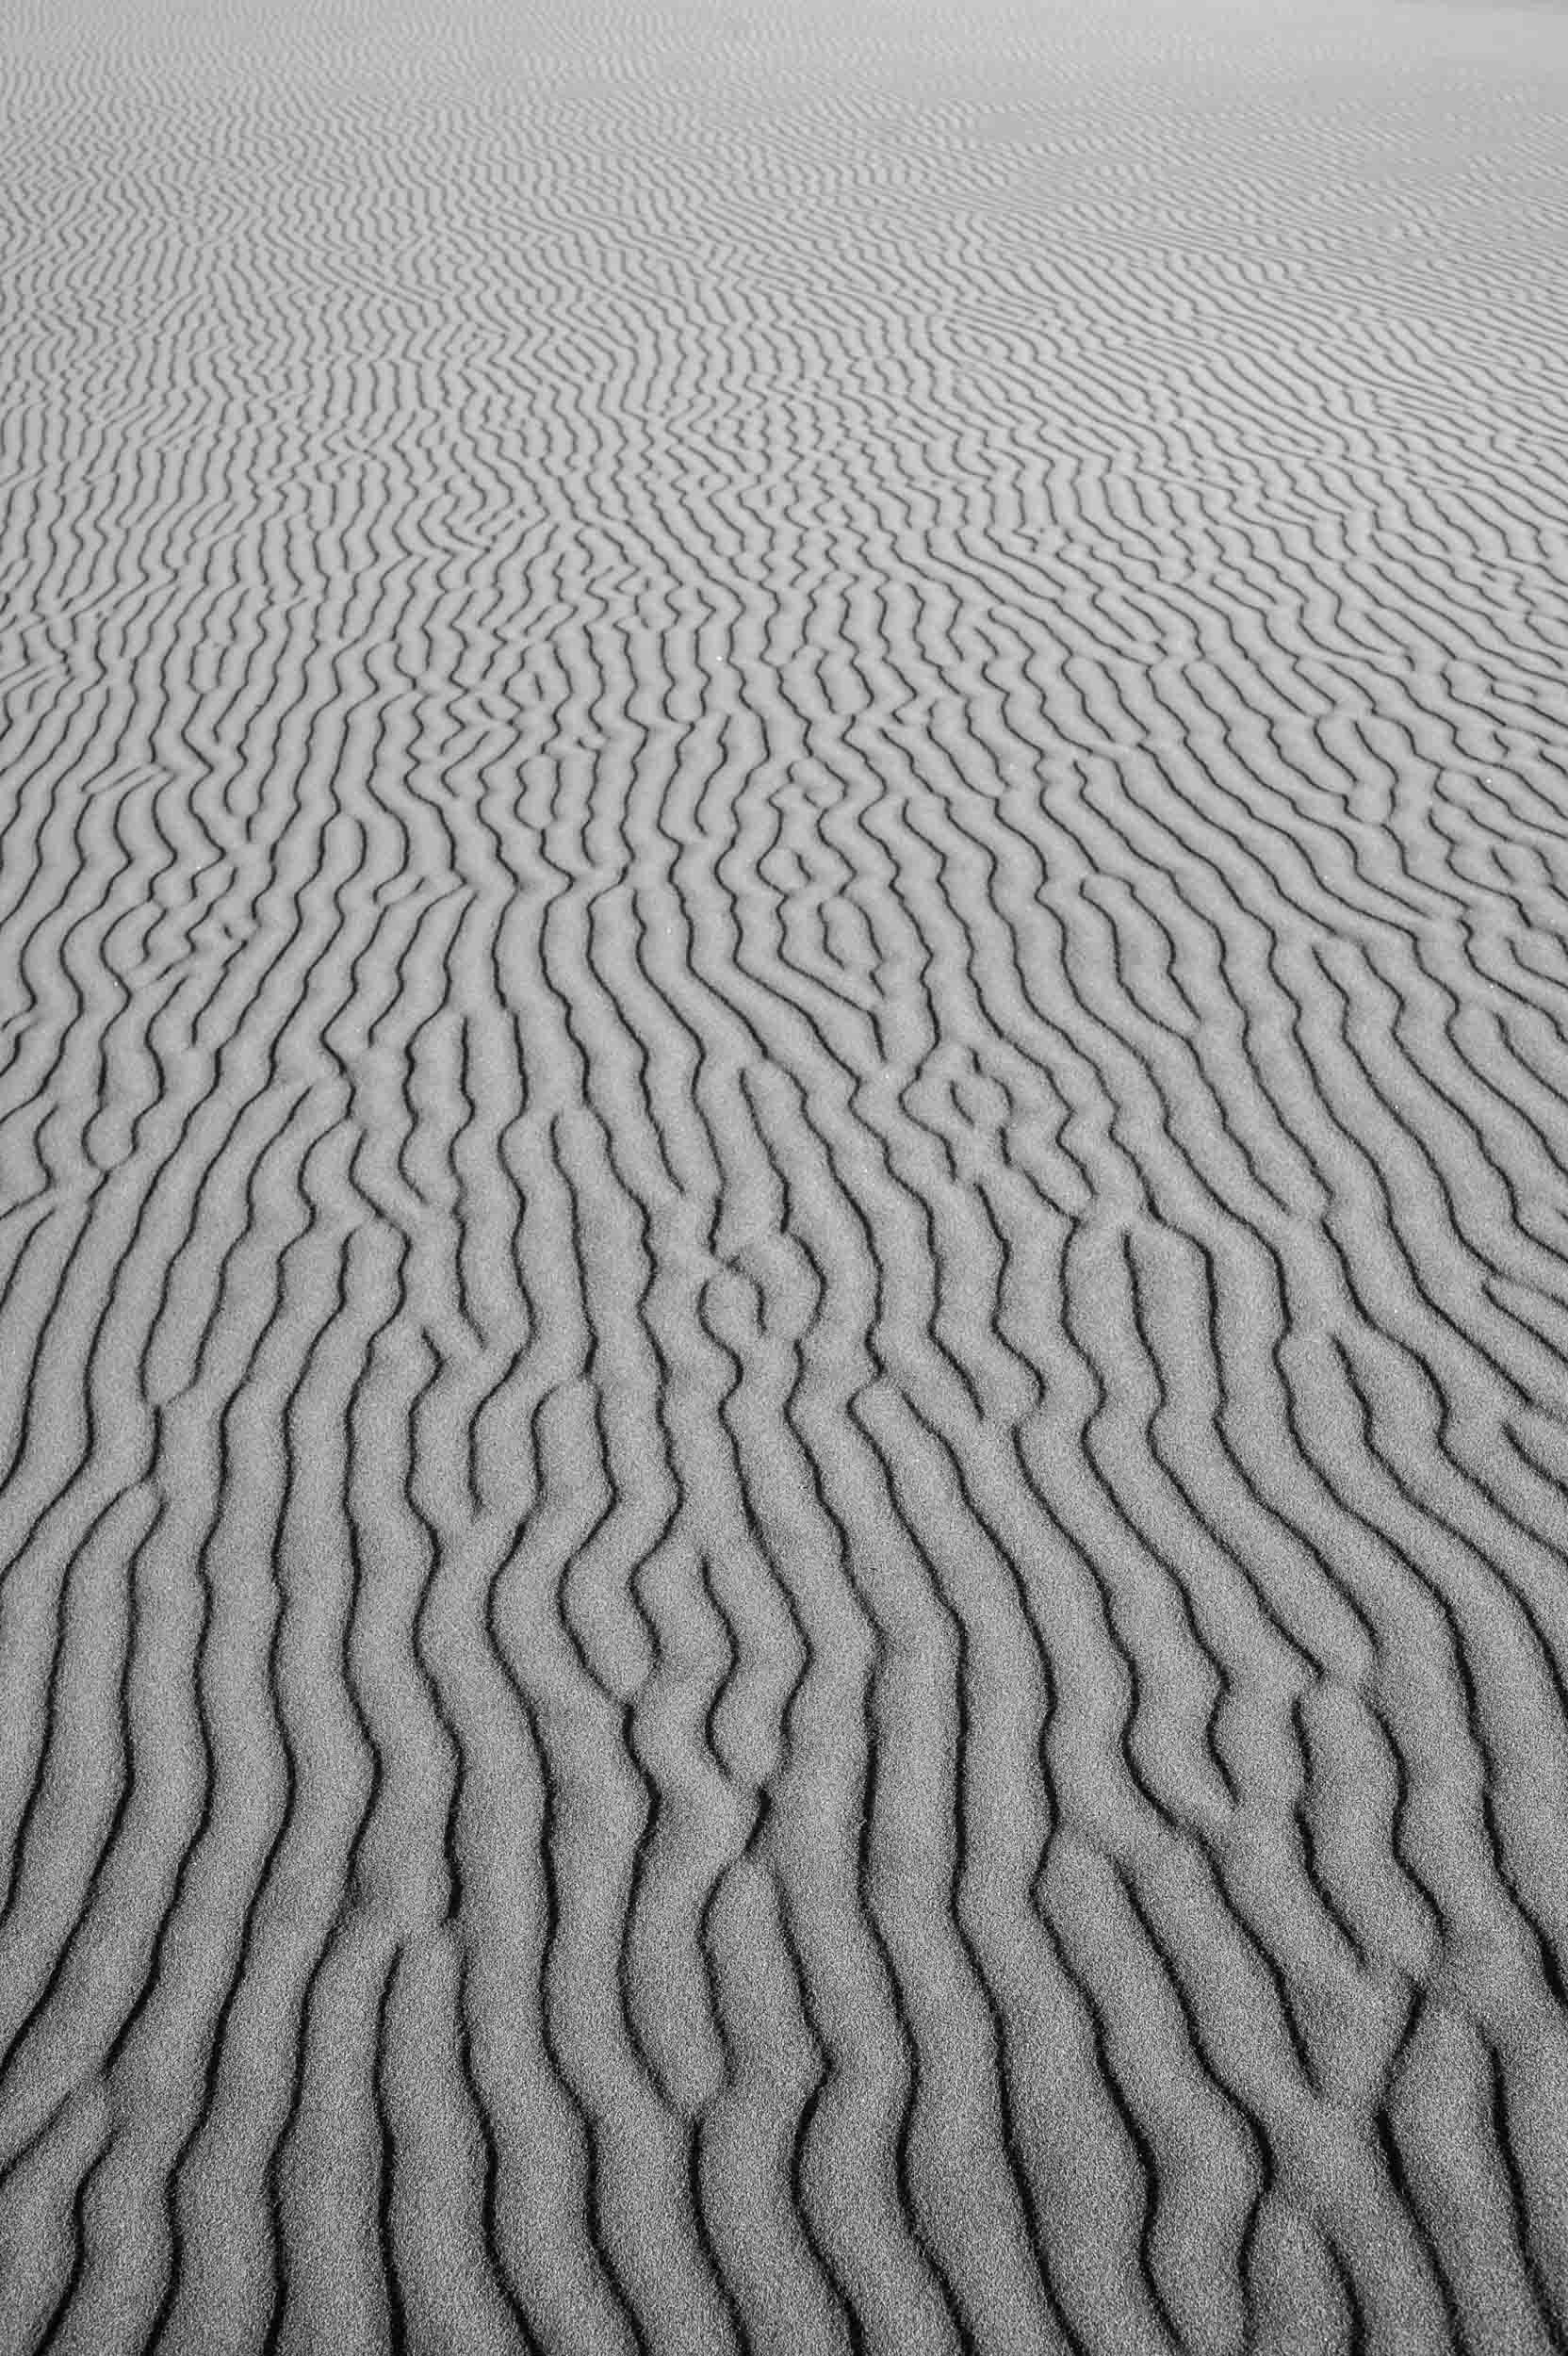 Sand Patterns-2.jpg